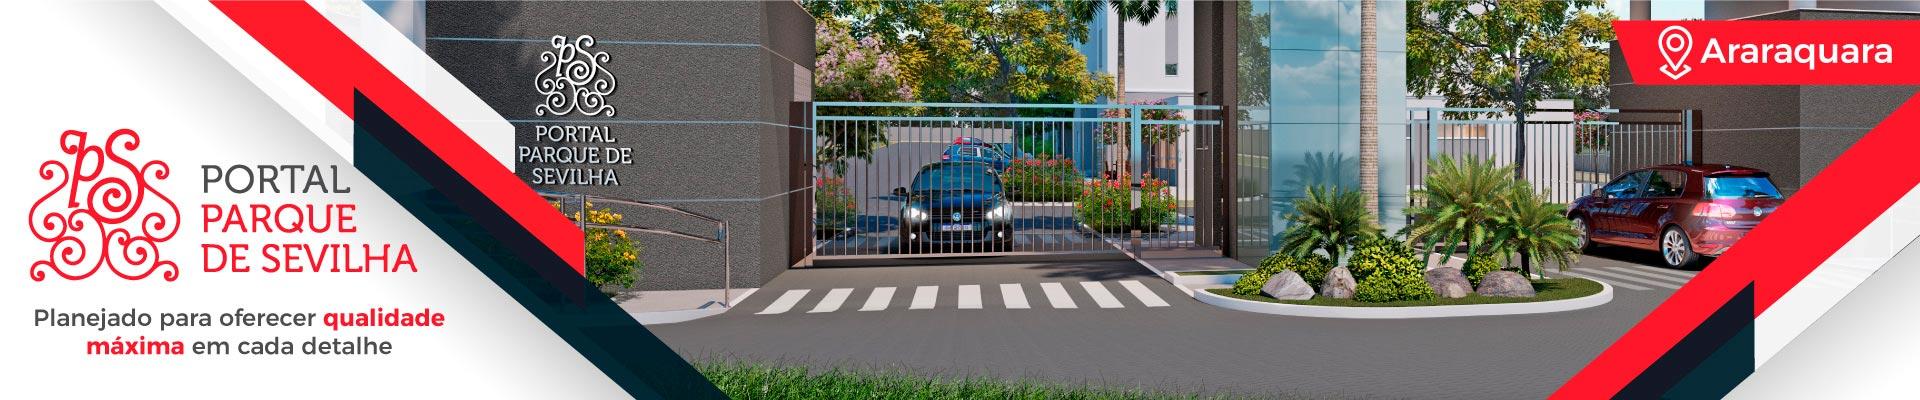 Portal Parque de Sevilha